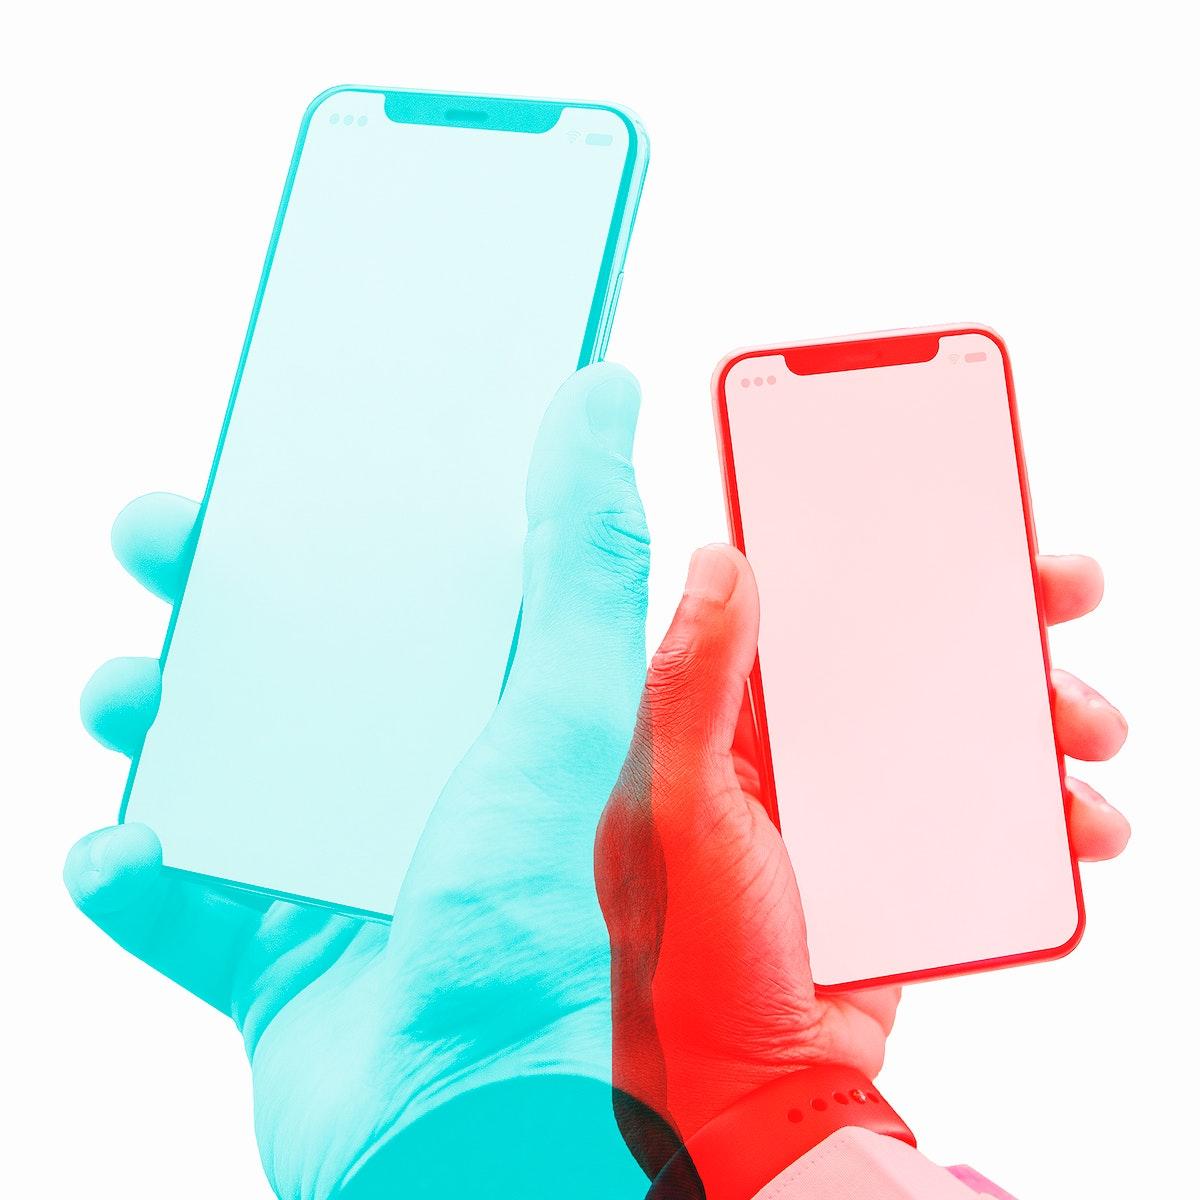 Smartphones with blank screens in double color exposure effect